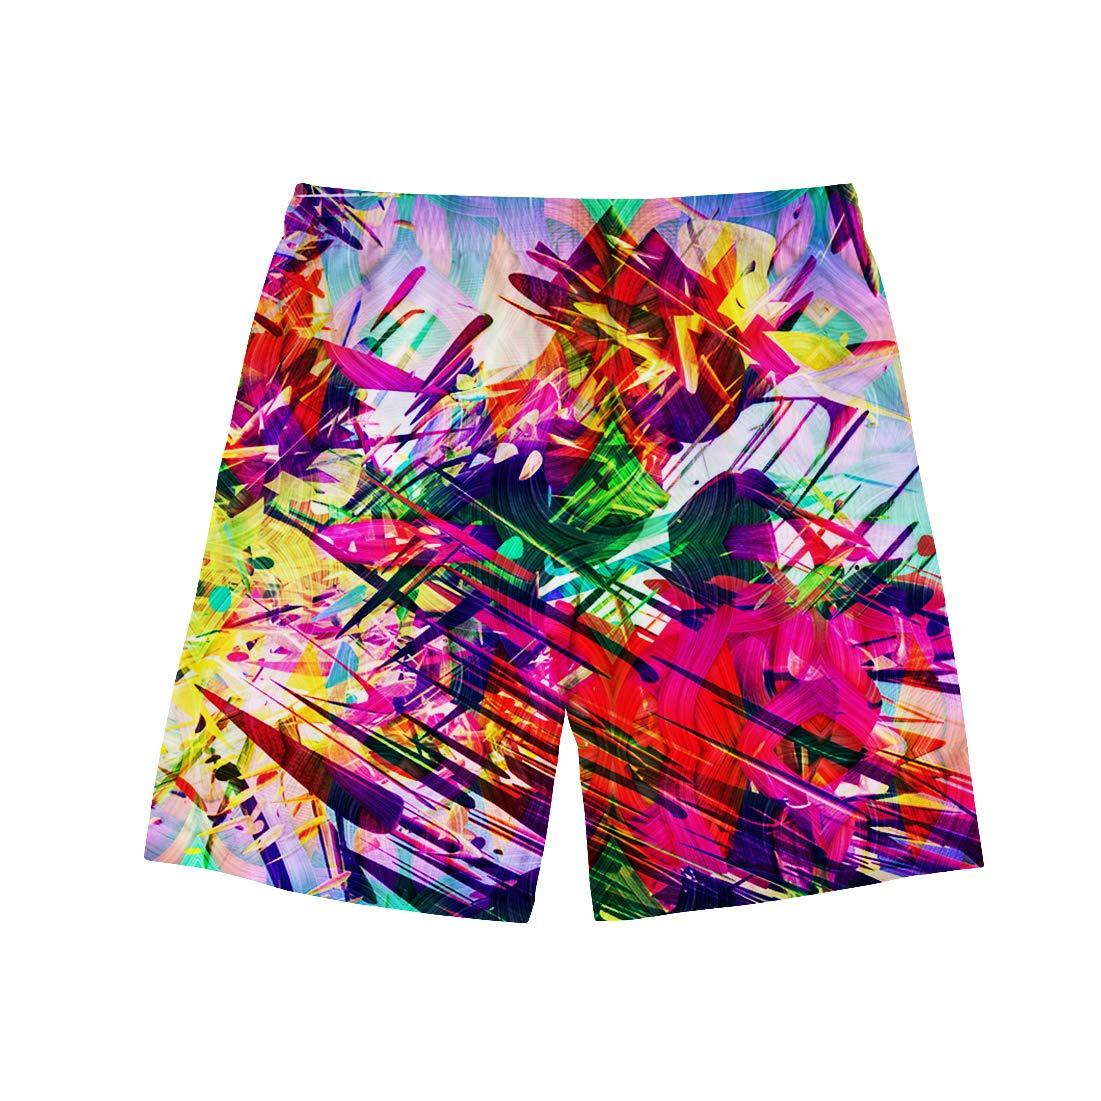 HMML Men Swim Trunks Quick Dry Surfing Beach Board Shorts Elastic Waist Pockets with Mesh Lining